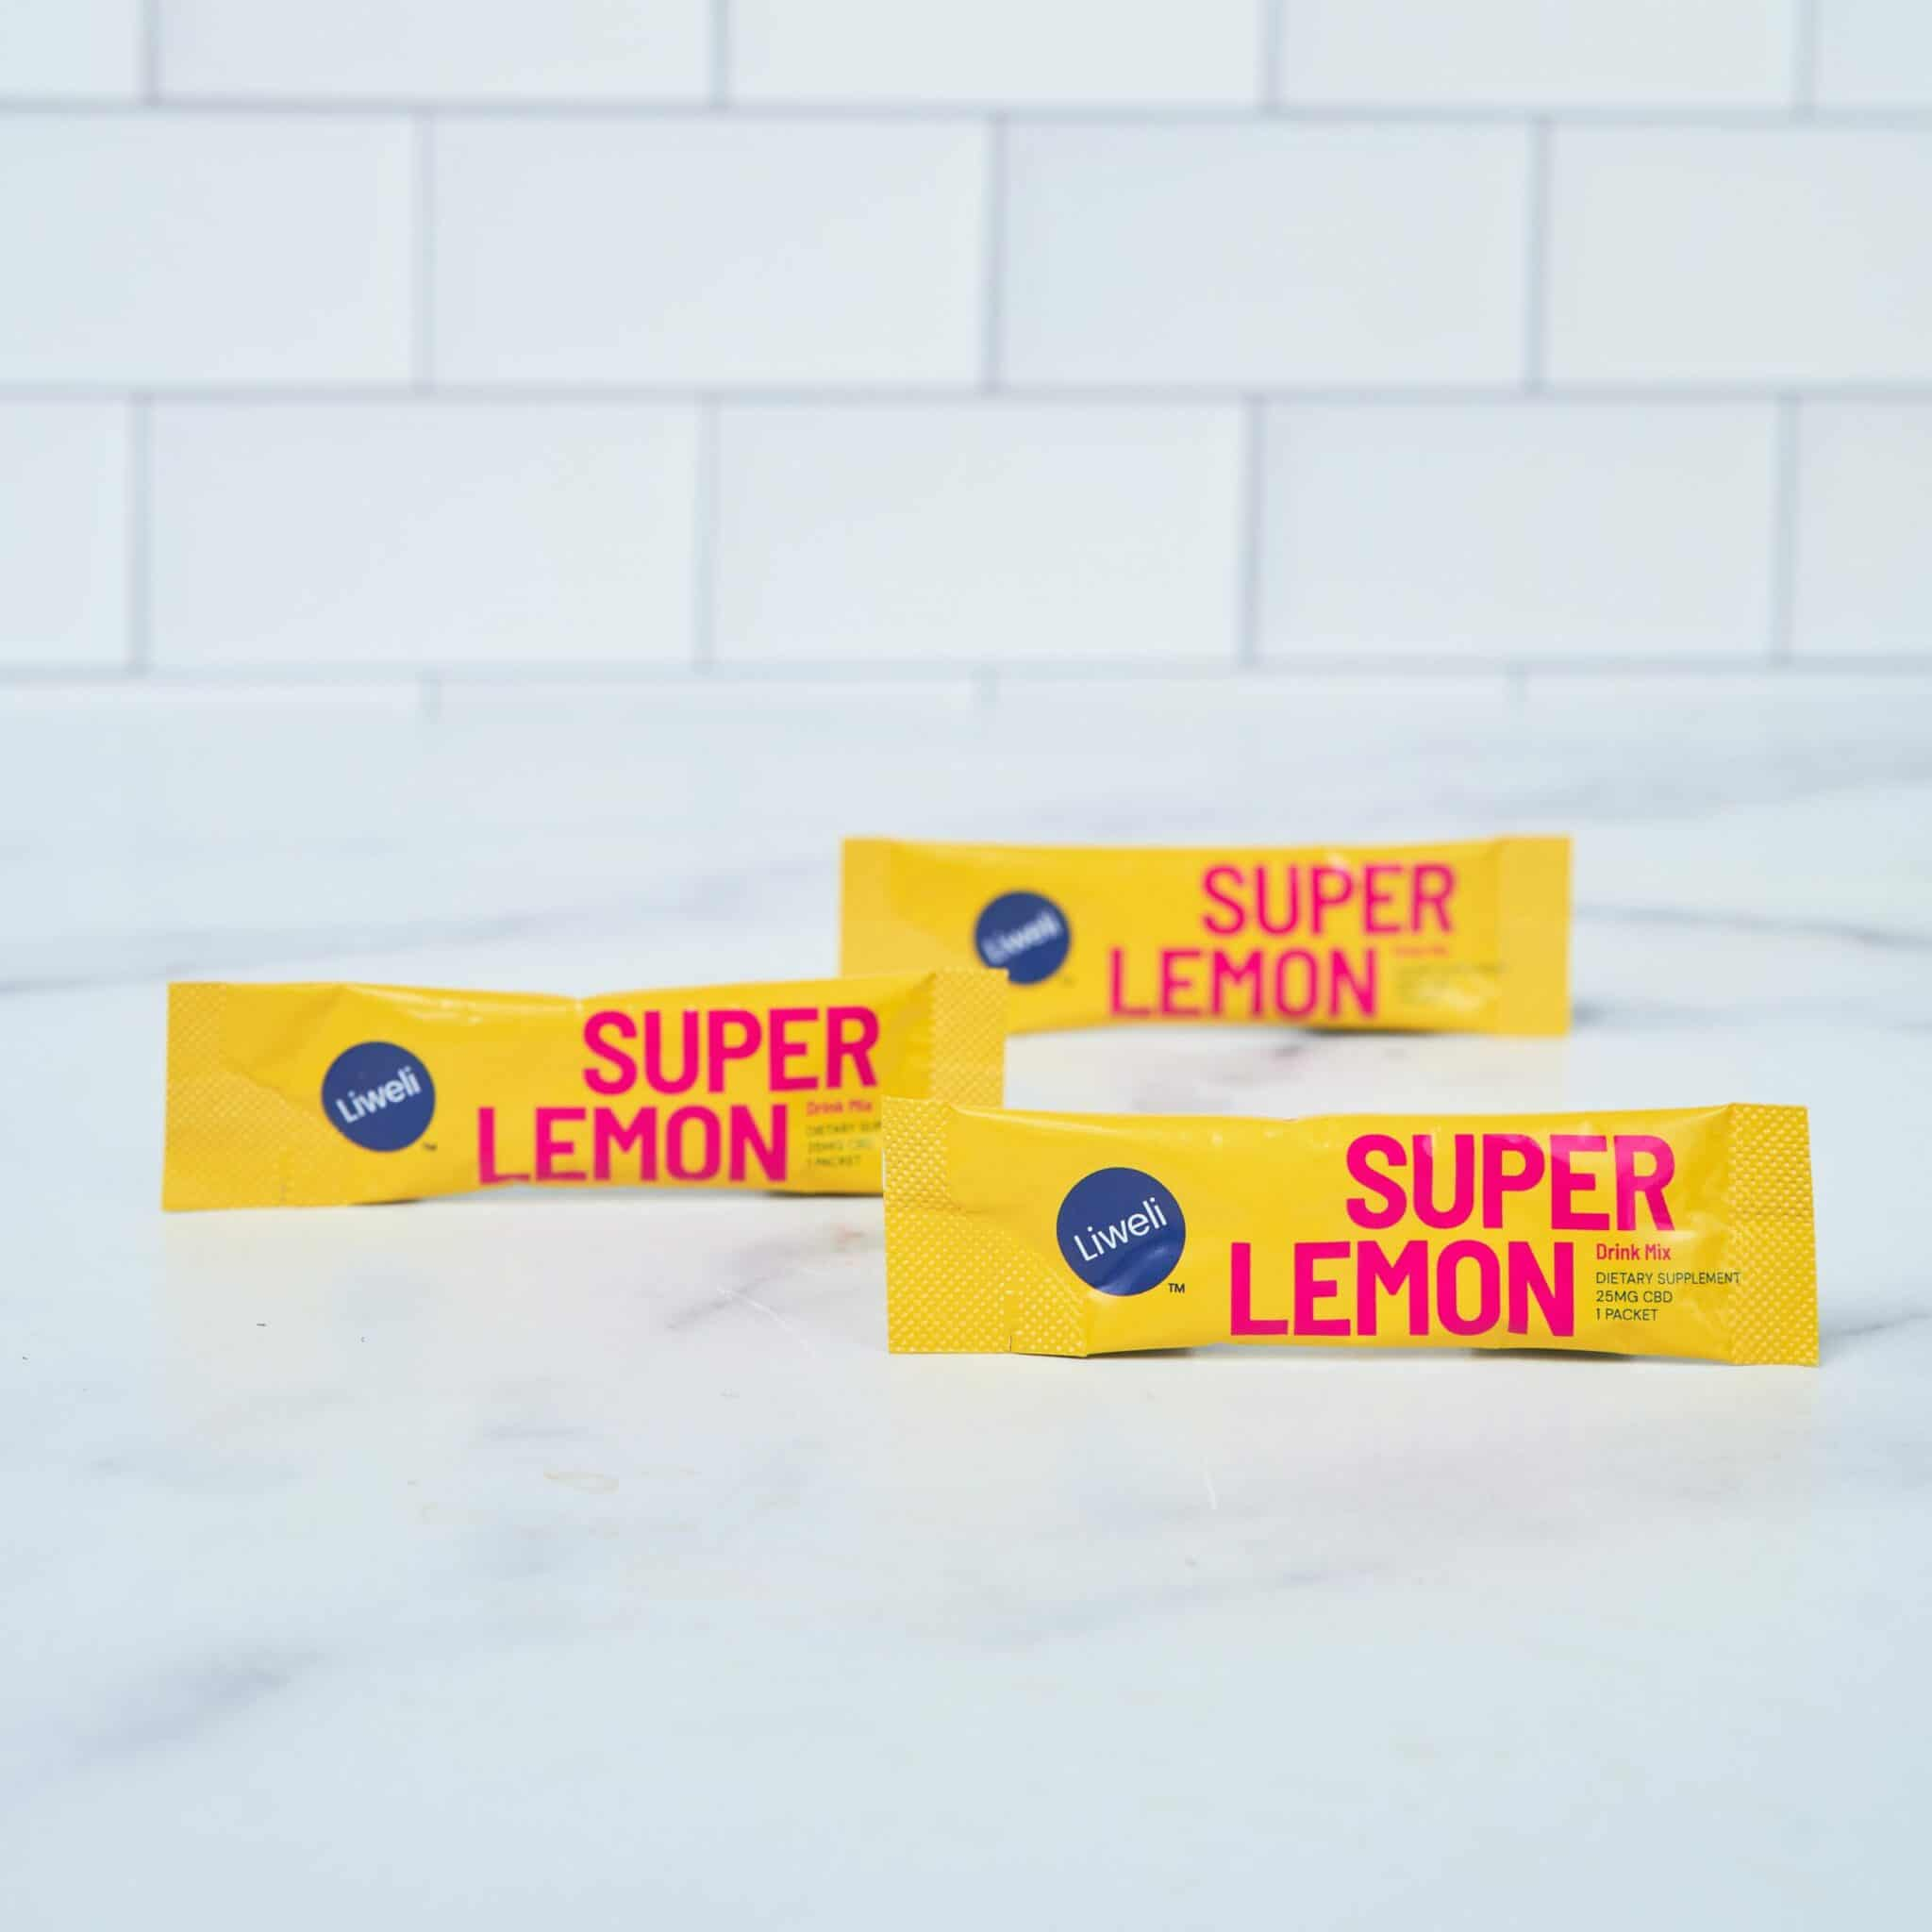 Liweli Super Lemon CBD Drink Mix Starter Kit scaled 1 scaled